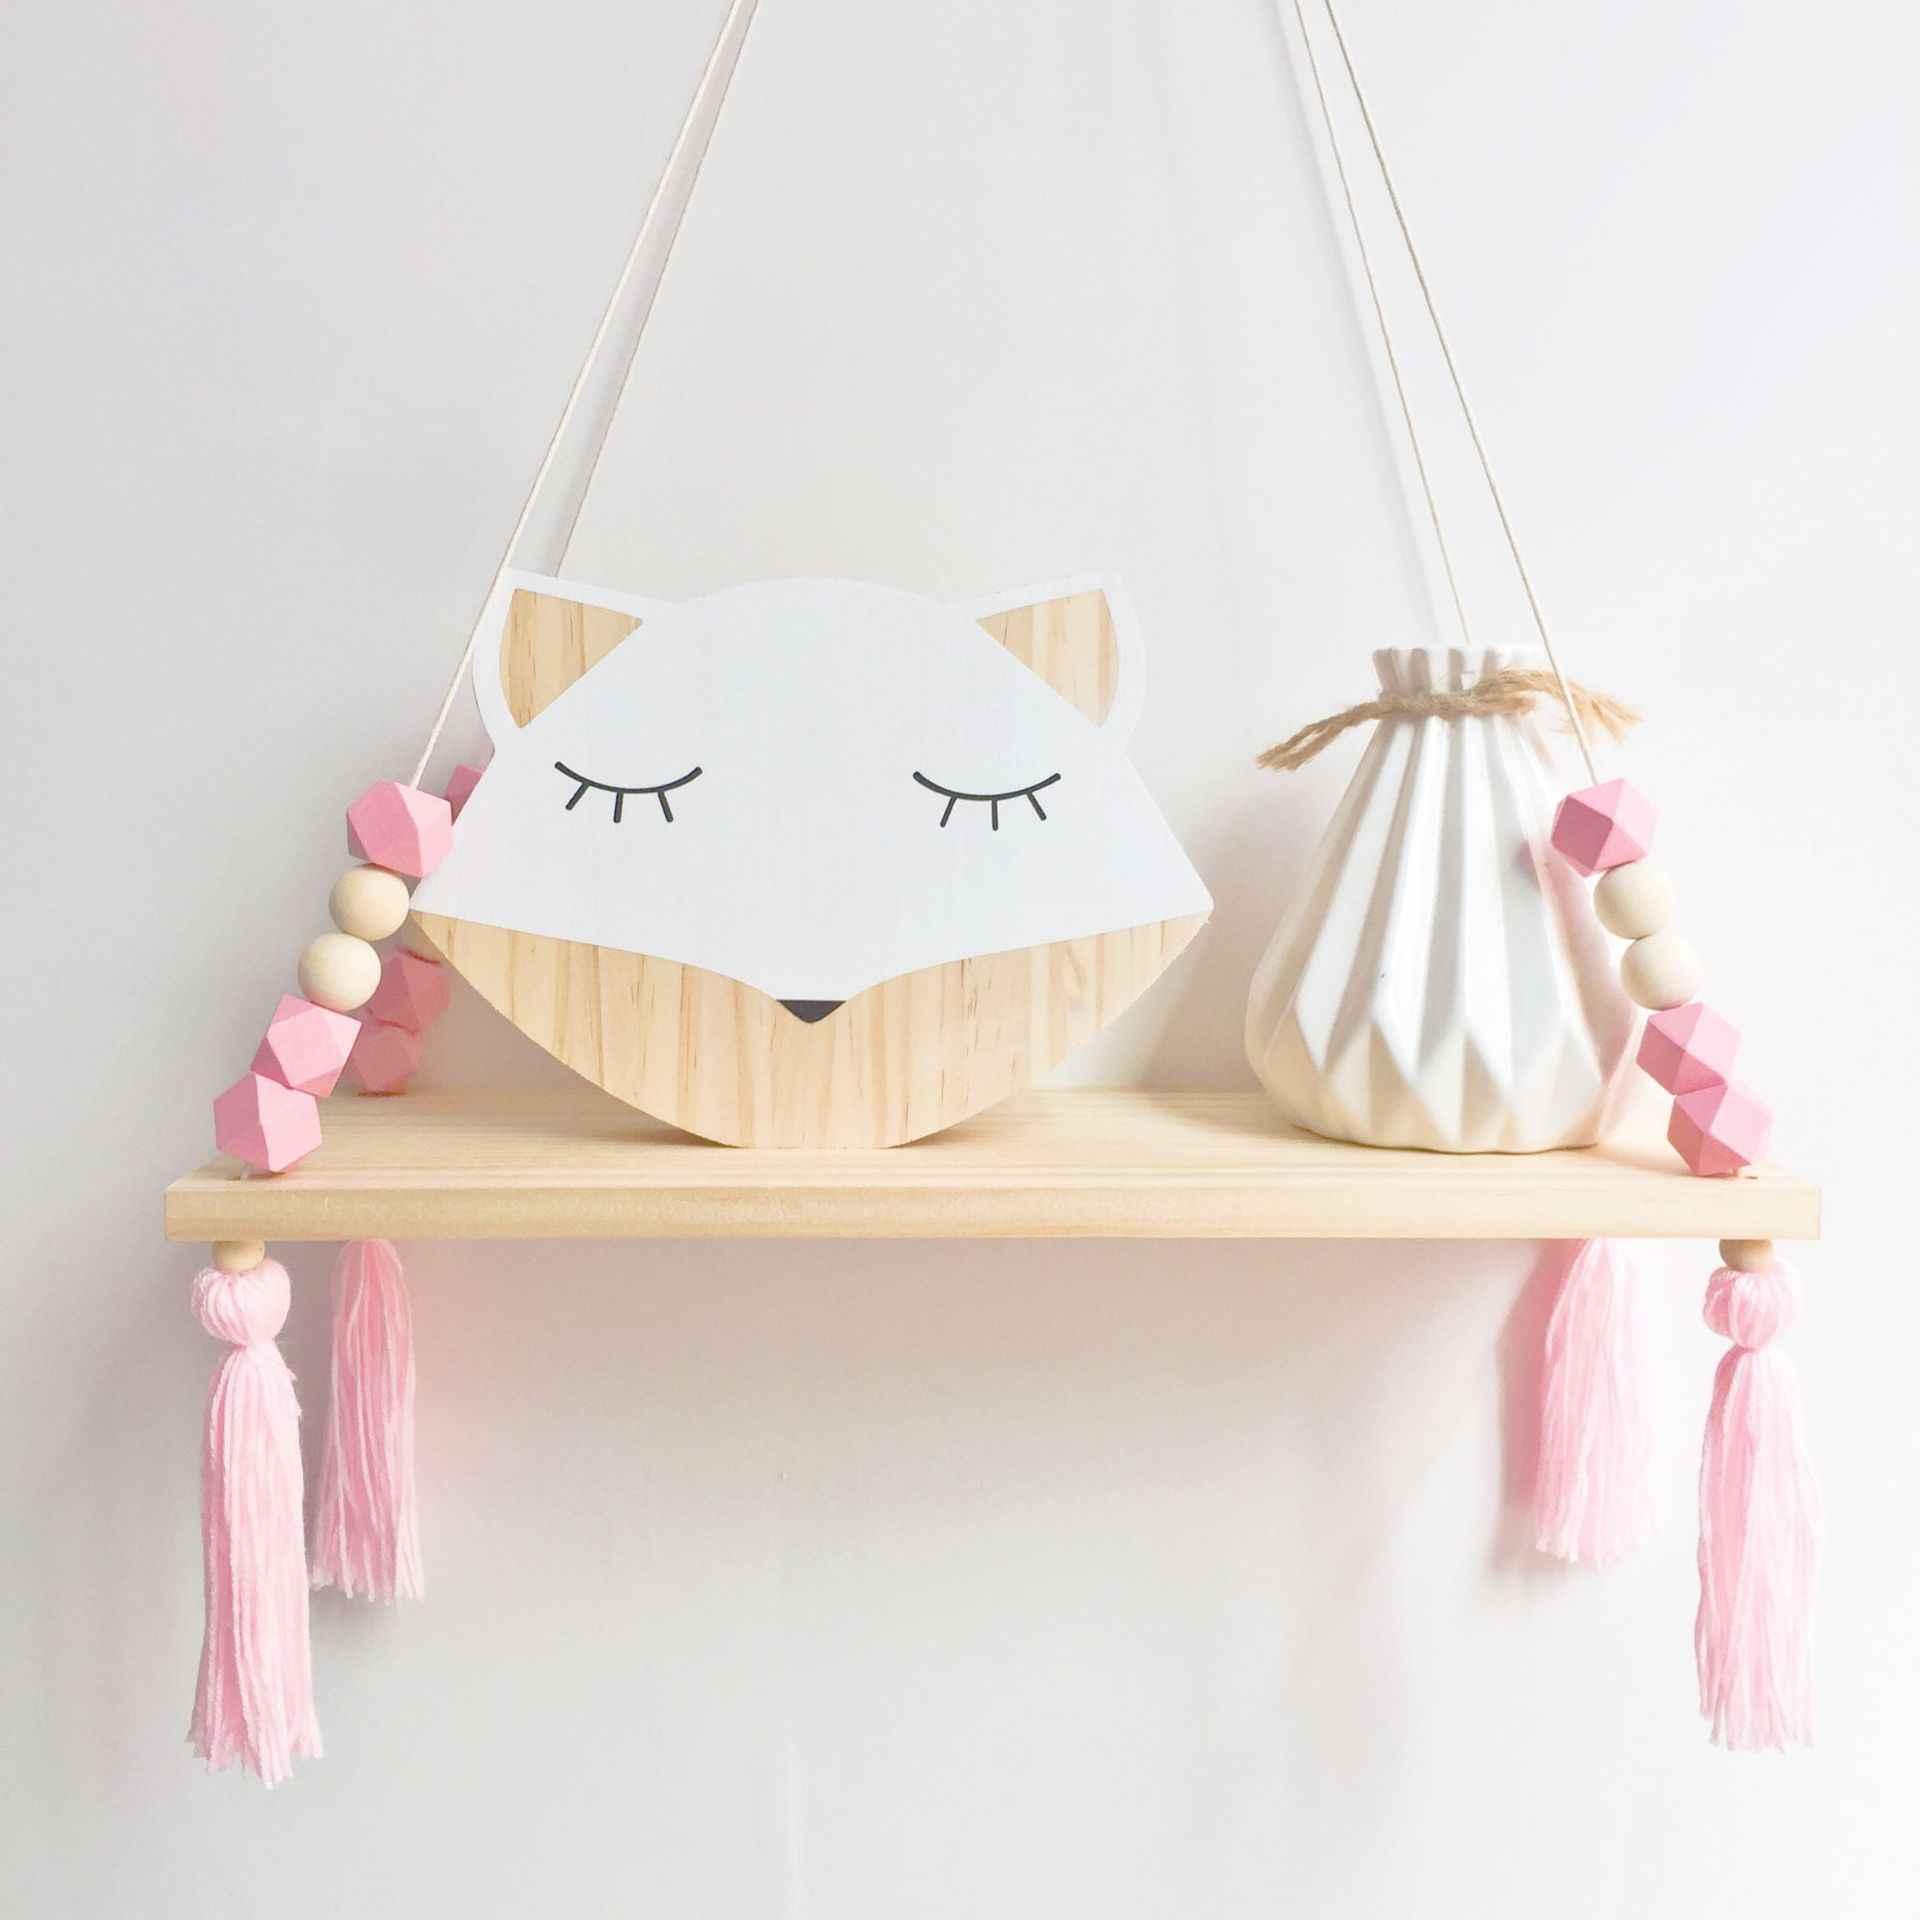 Nordic Wooden House Wall Trinket Shelf Decor Scandi Children/'s Kids Room Nursery